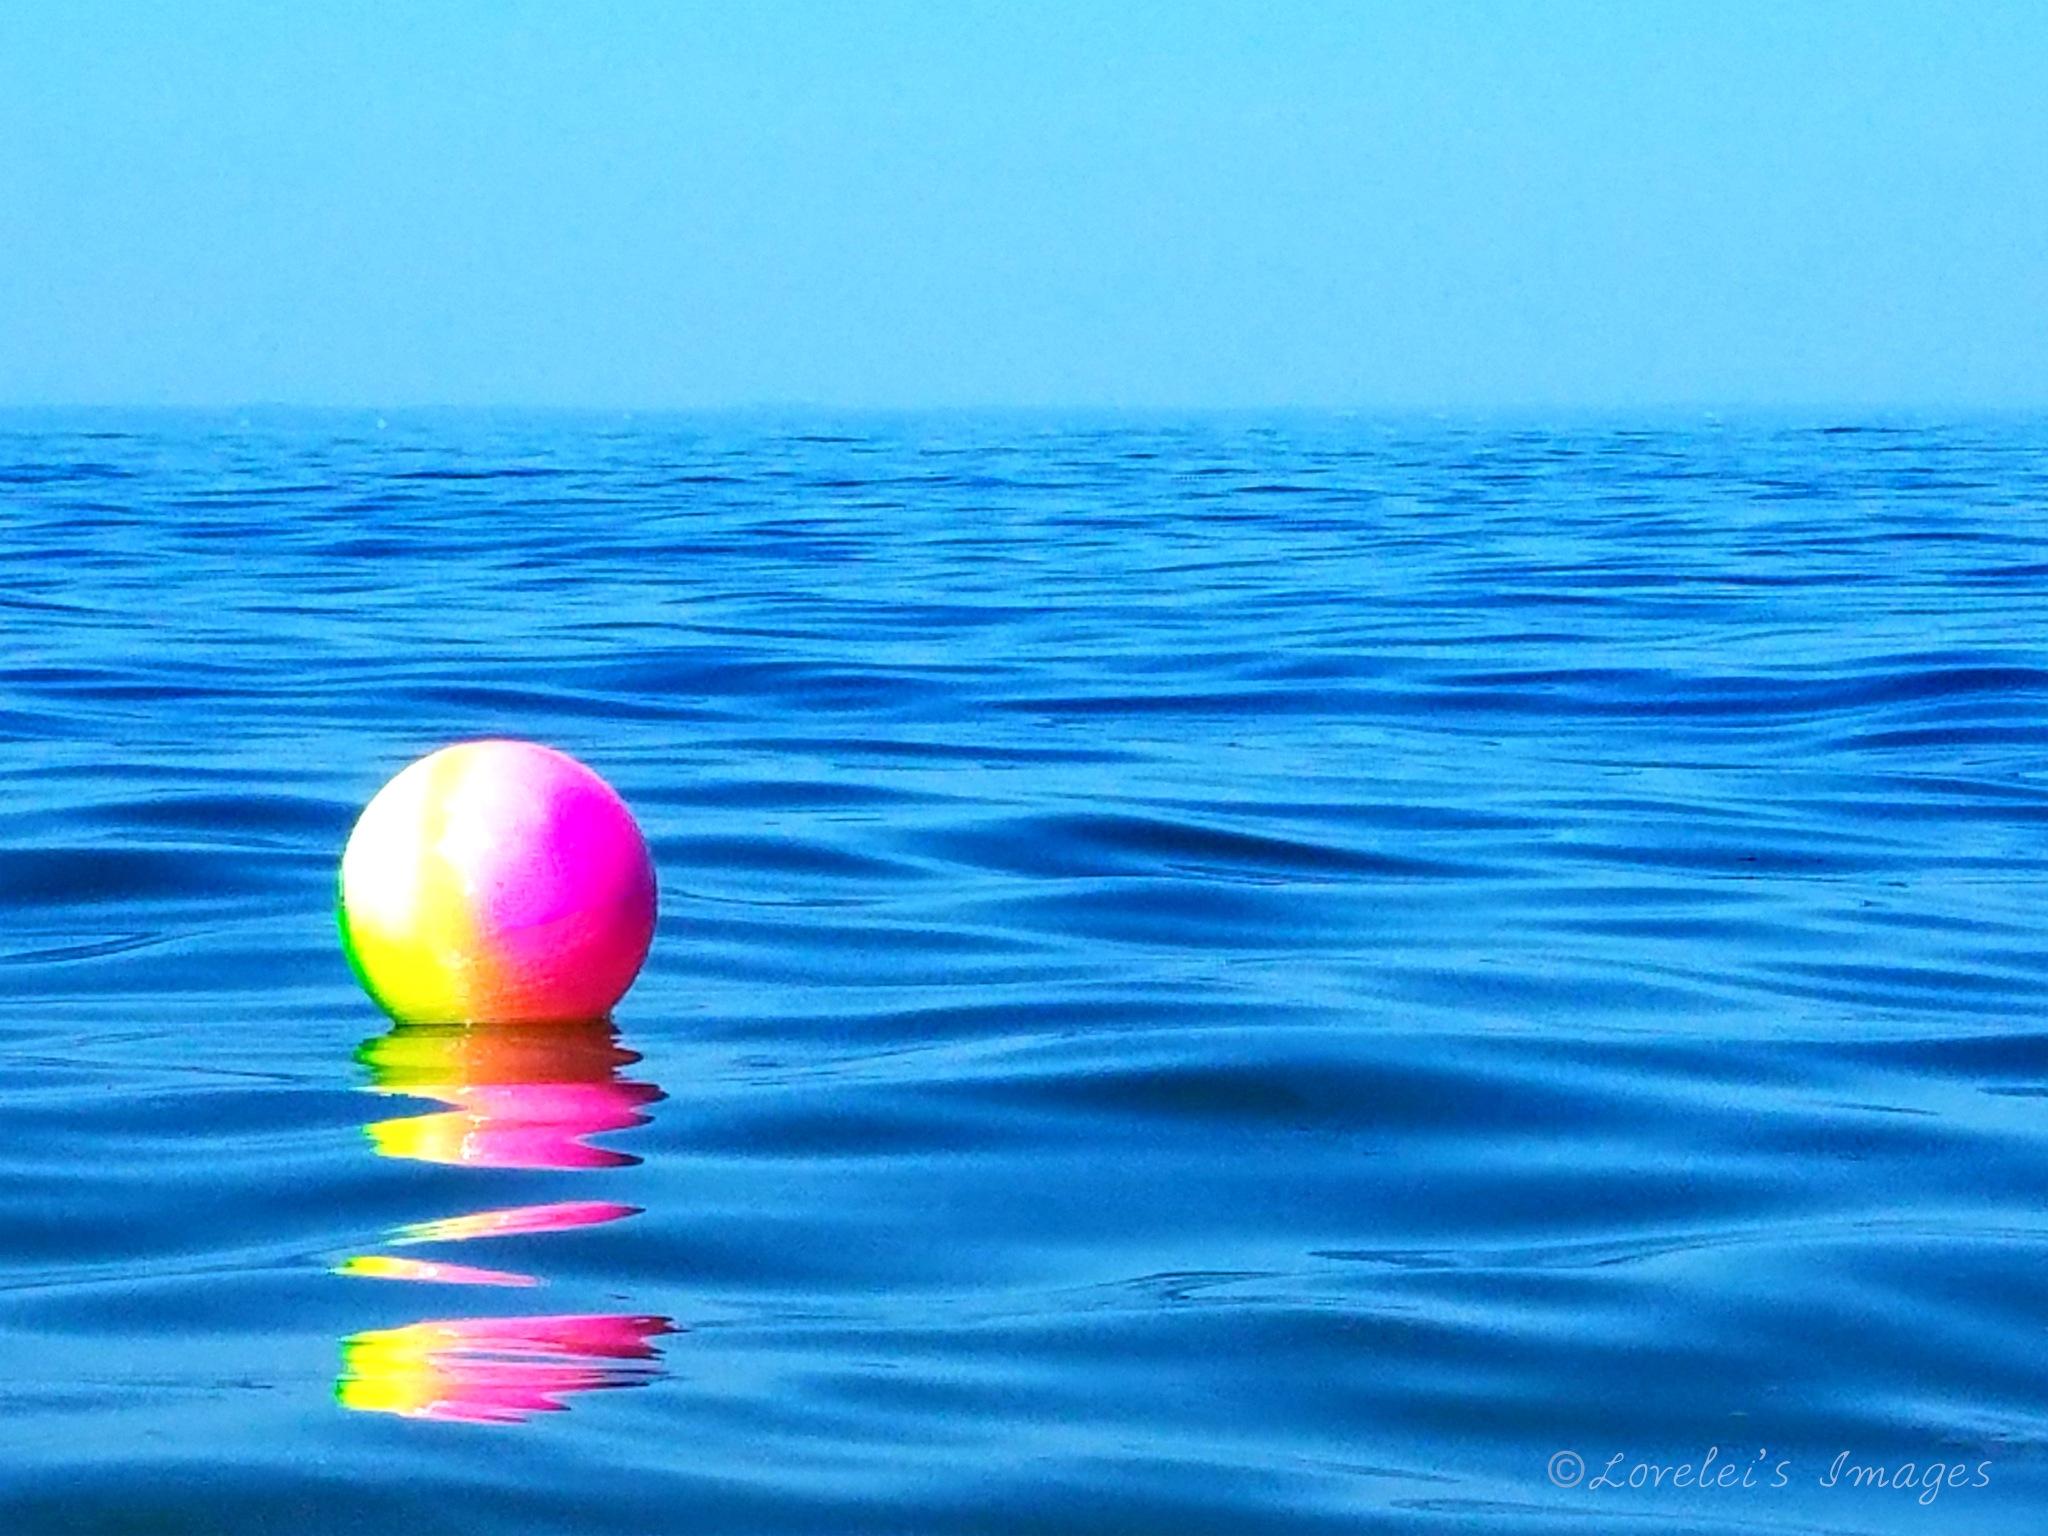 A Spot of Color by Loredana Terpe